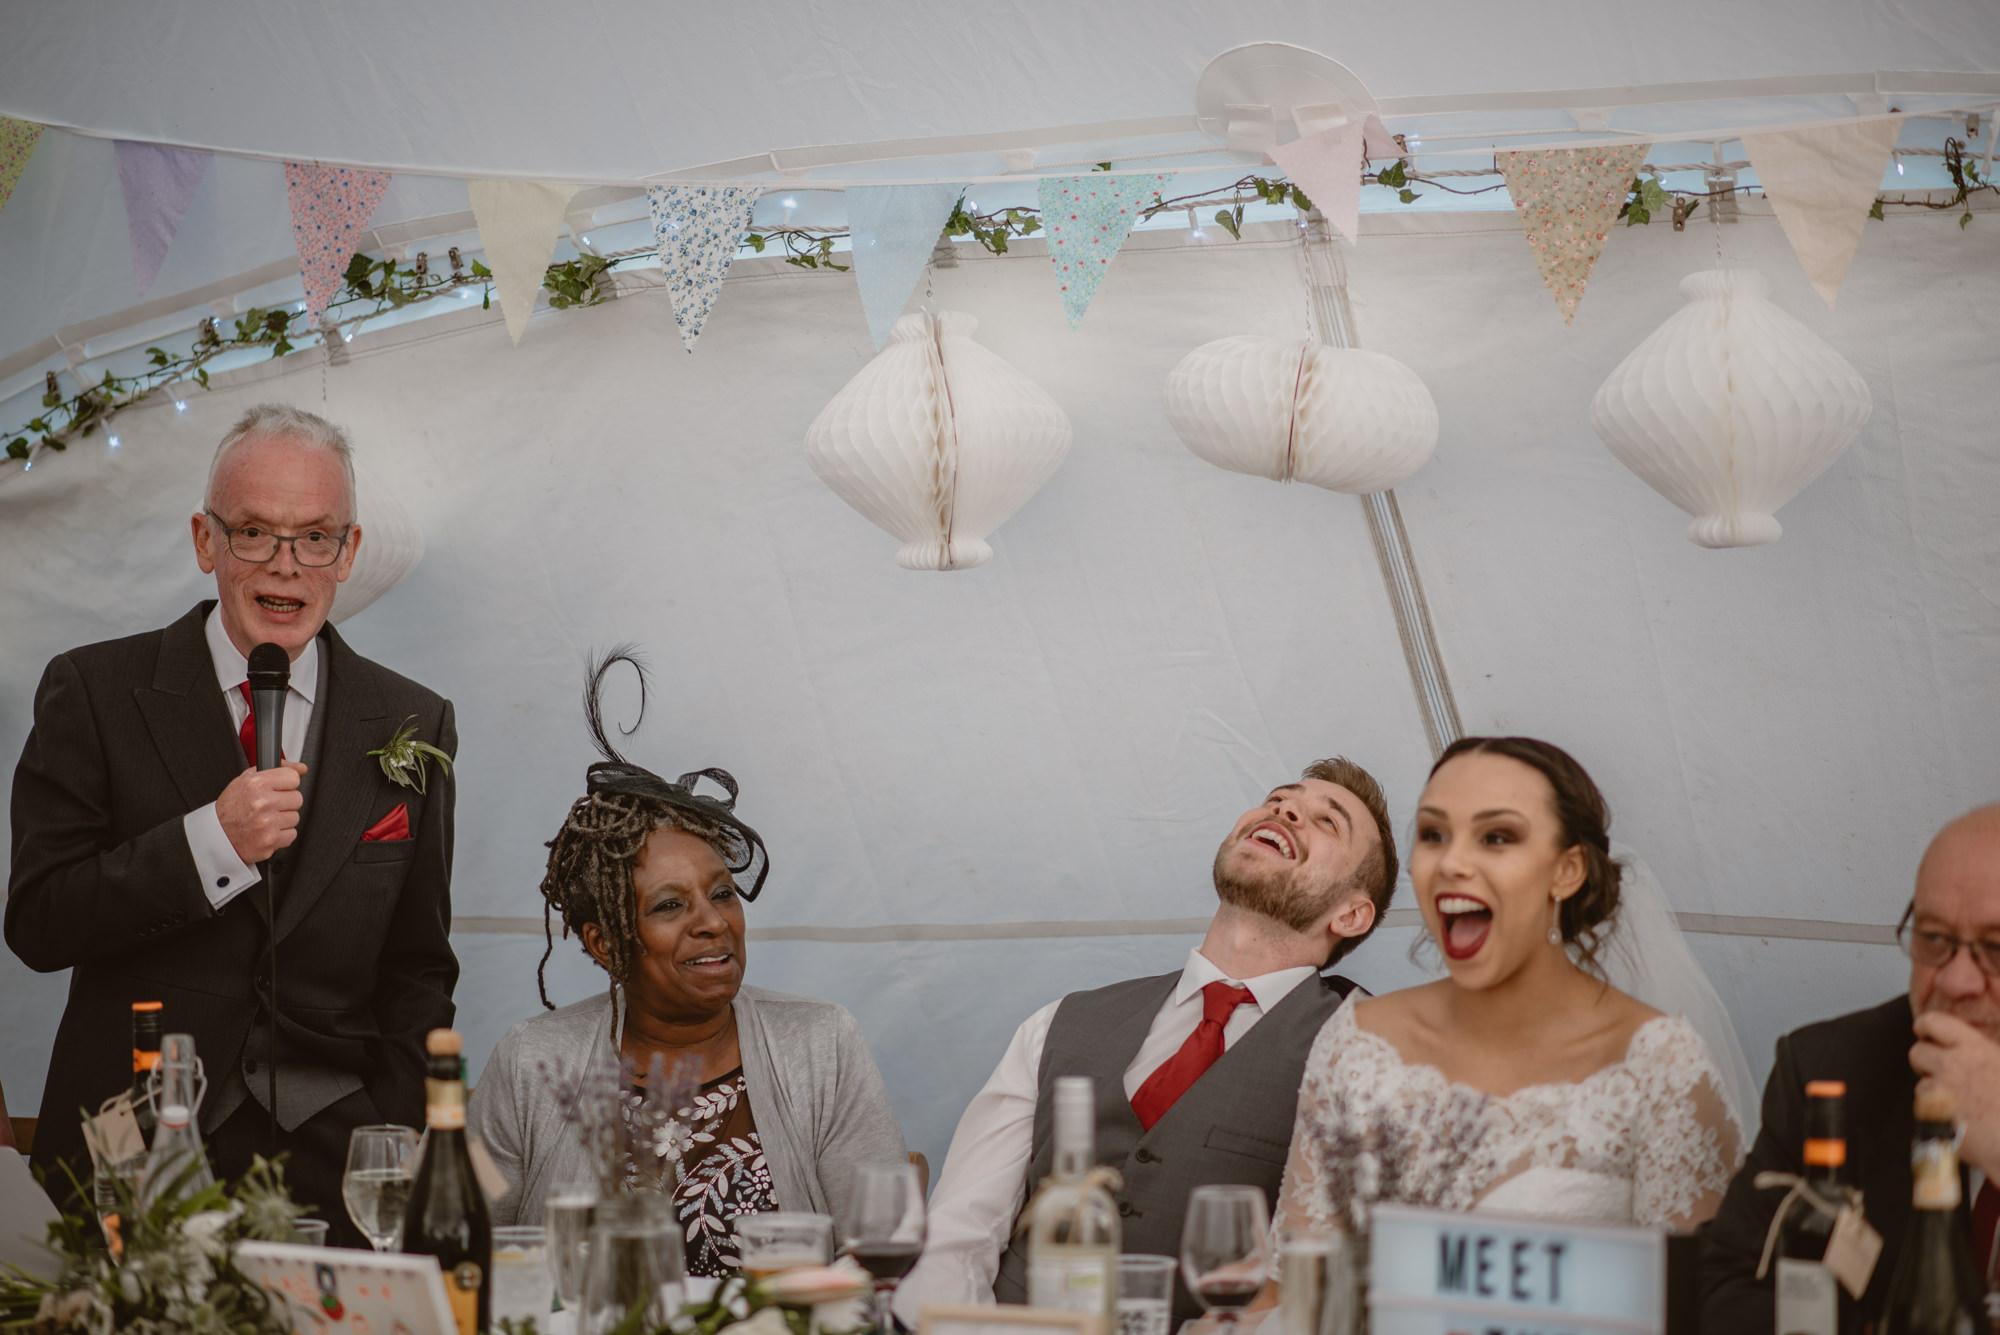 Jacqueline-Gareth-Wedding-Westmead-Events-Surrey-Manu-Mendoza-Wedding-Photography-392.jpg